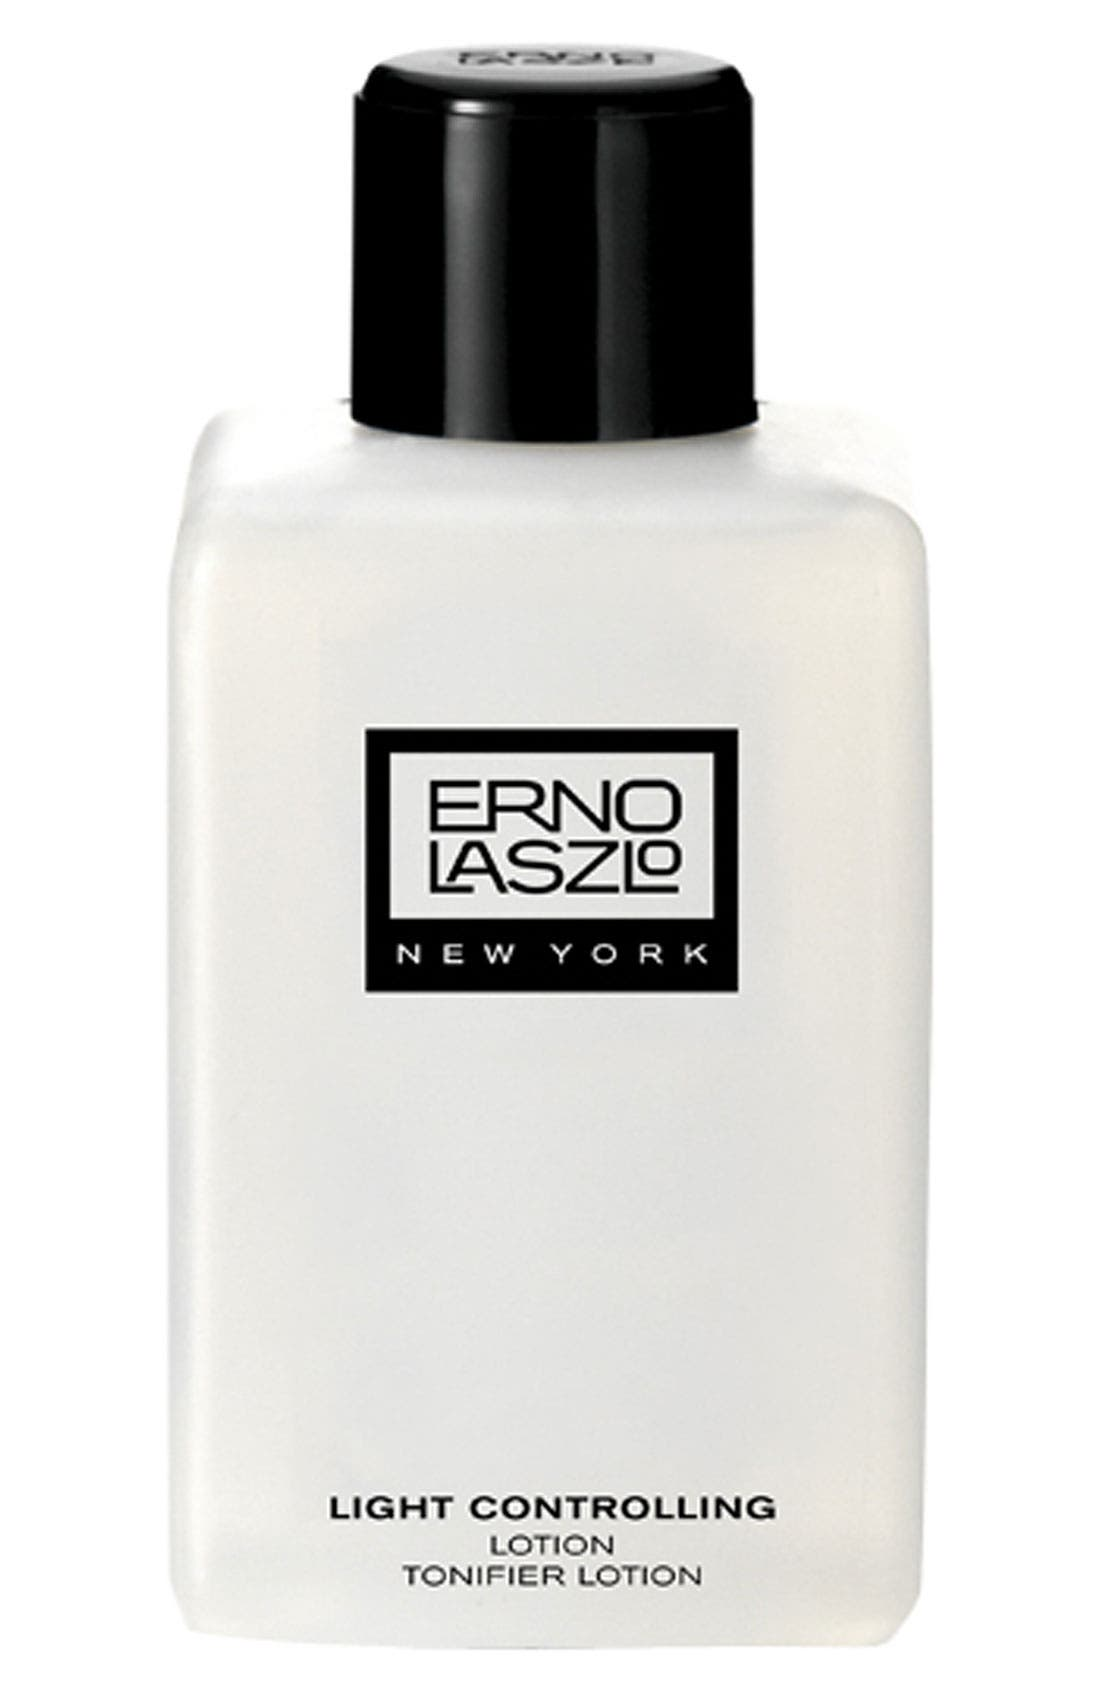 Erno Laszlo 'Light Controlling' Toner (Jumbo Size) ($97 Value)